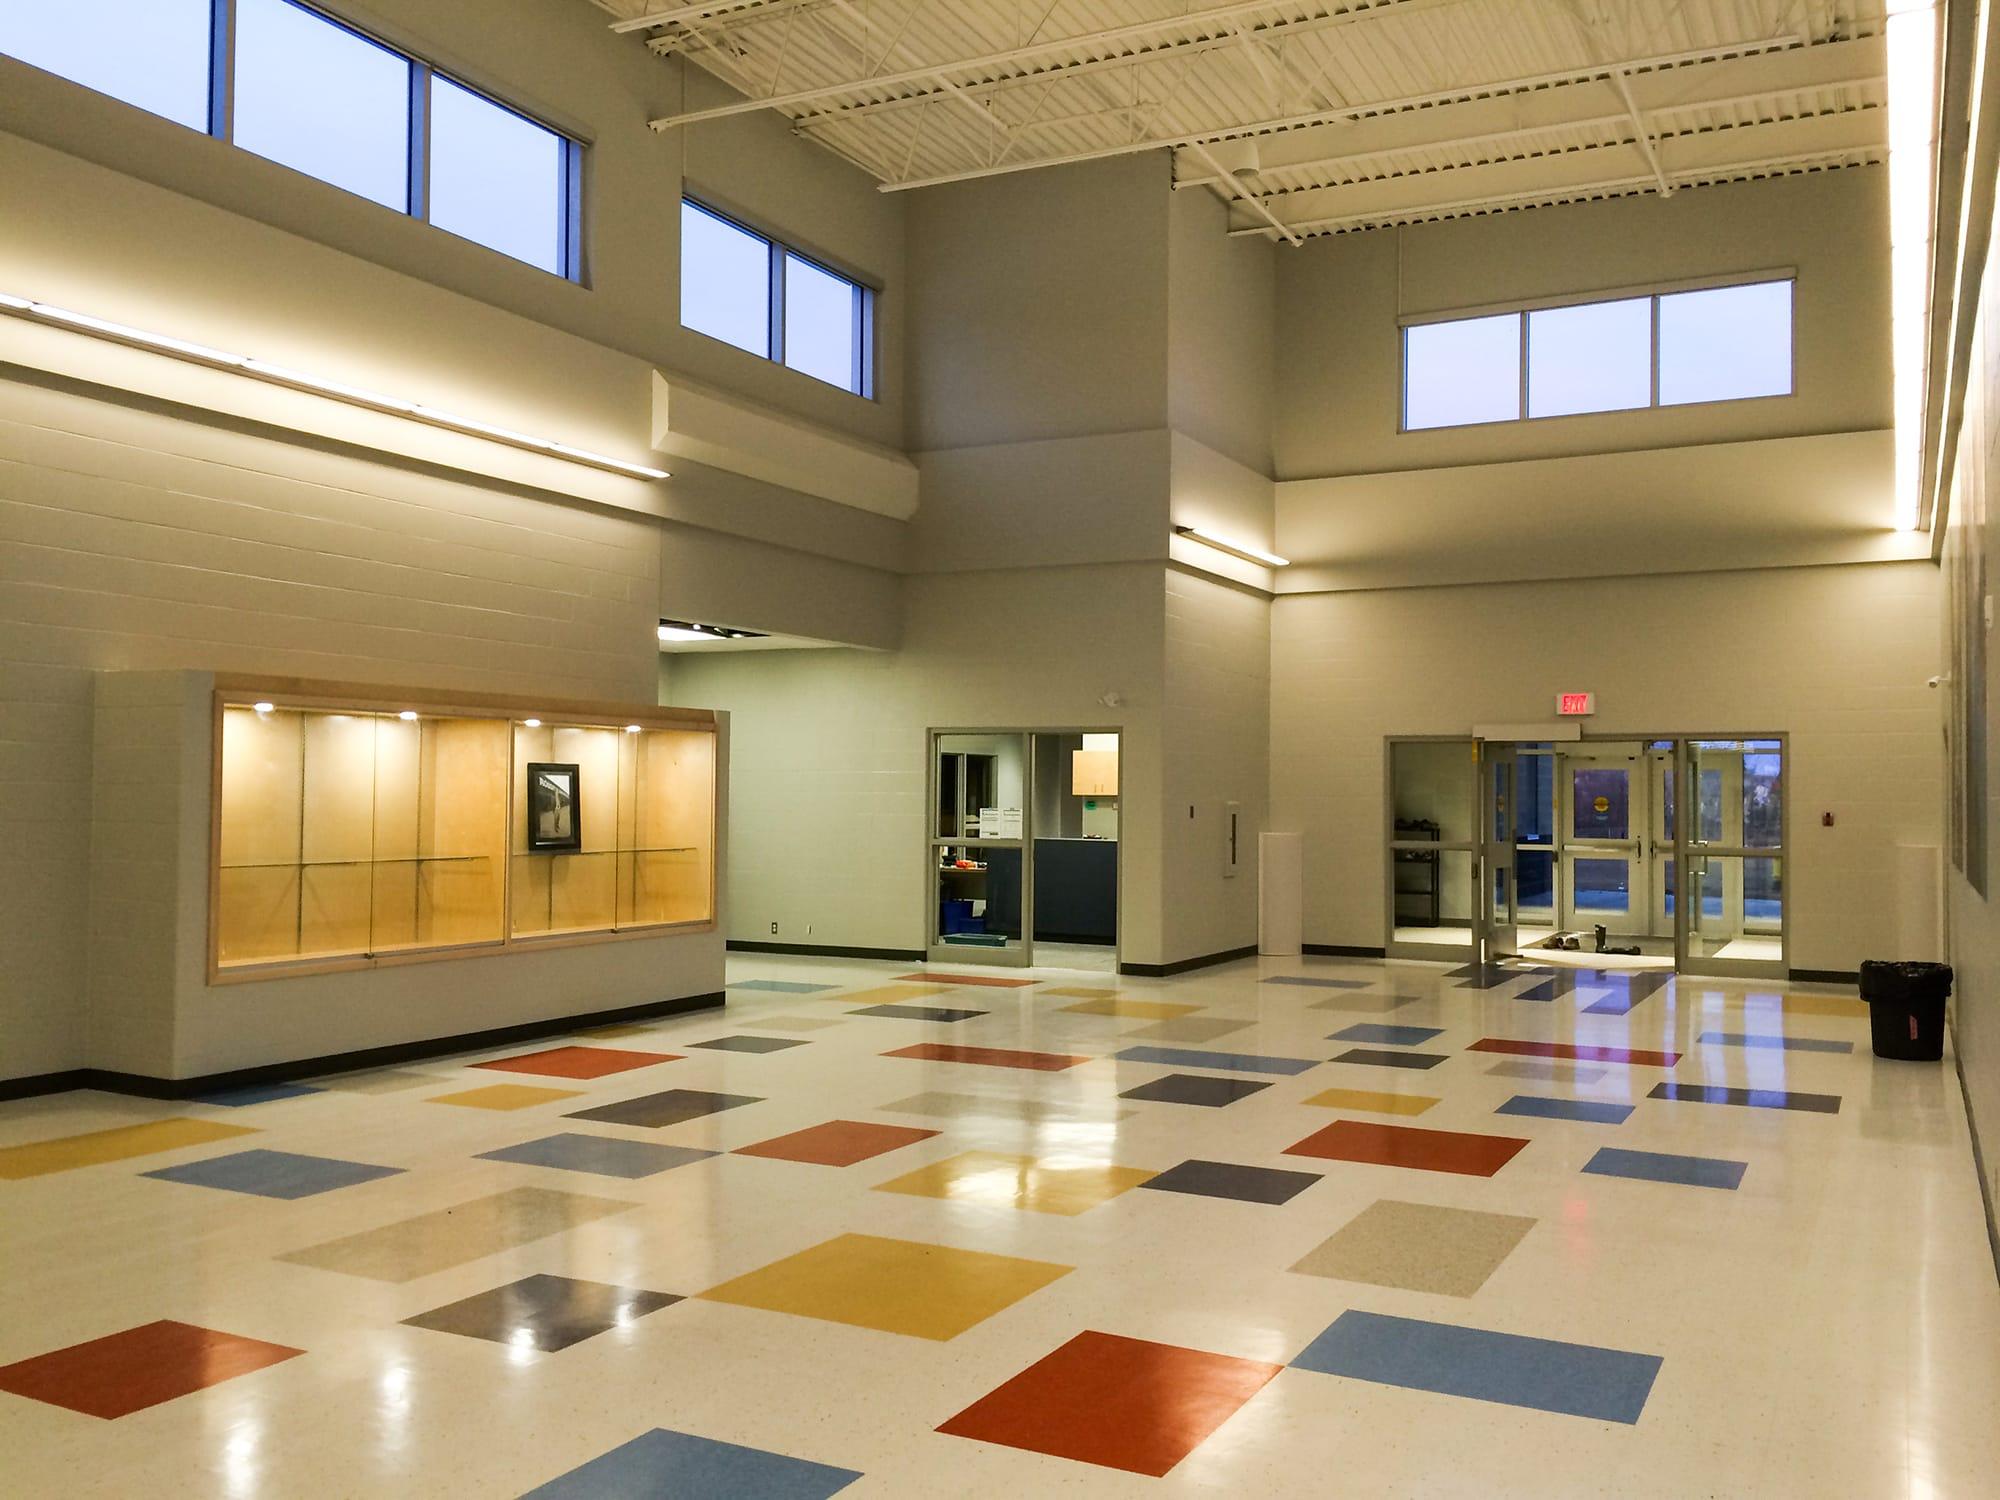 Robert W Zahara Public School interior